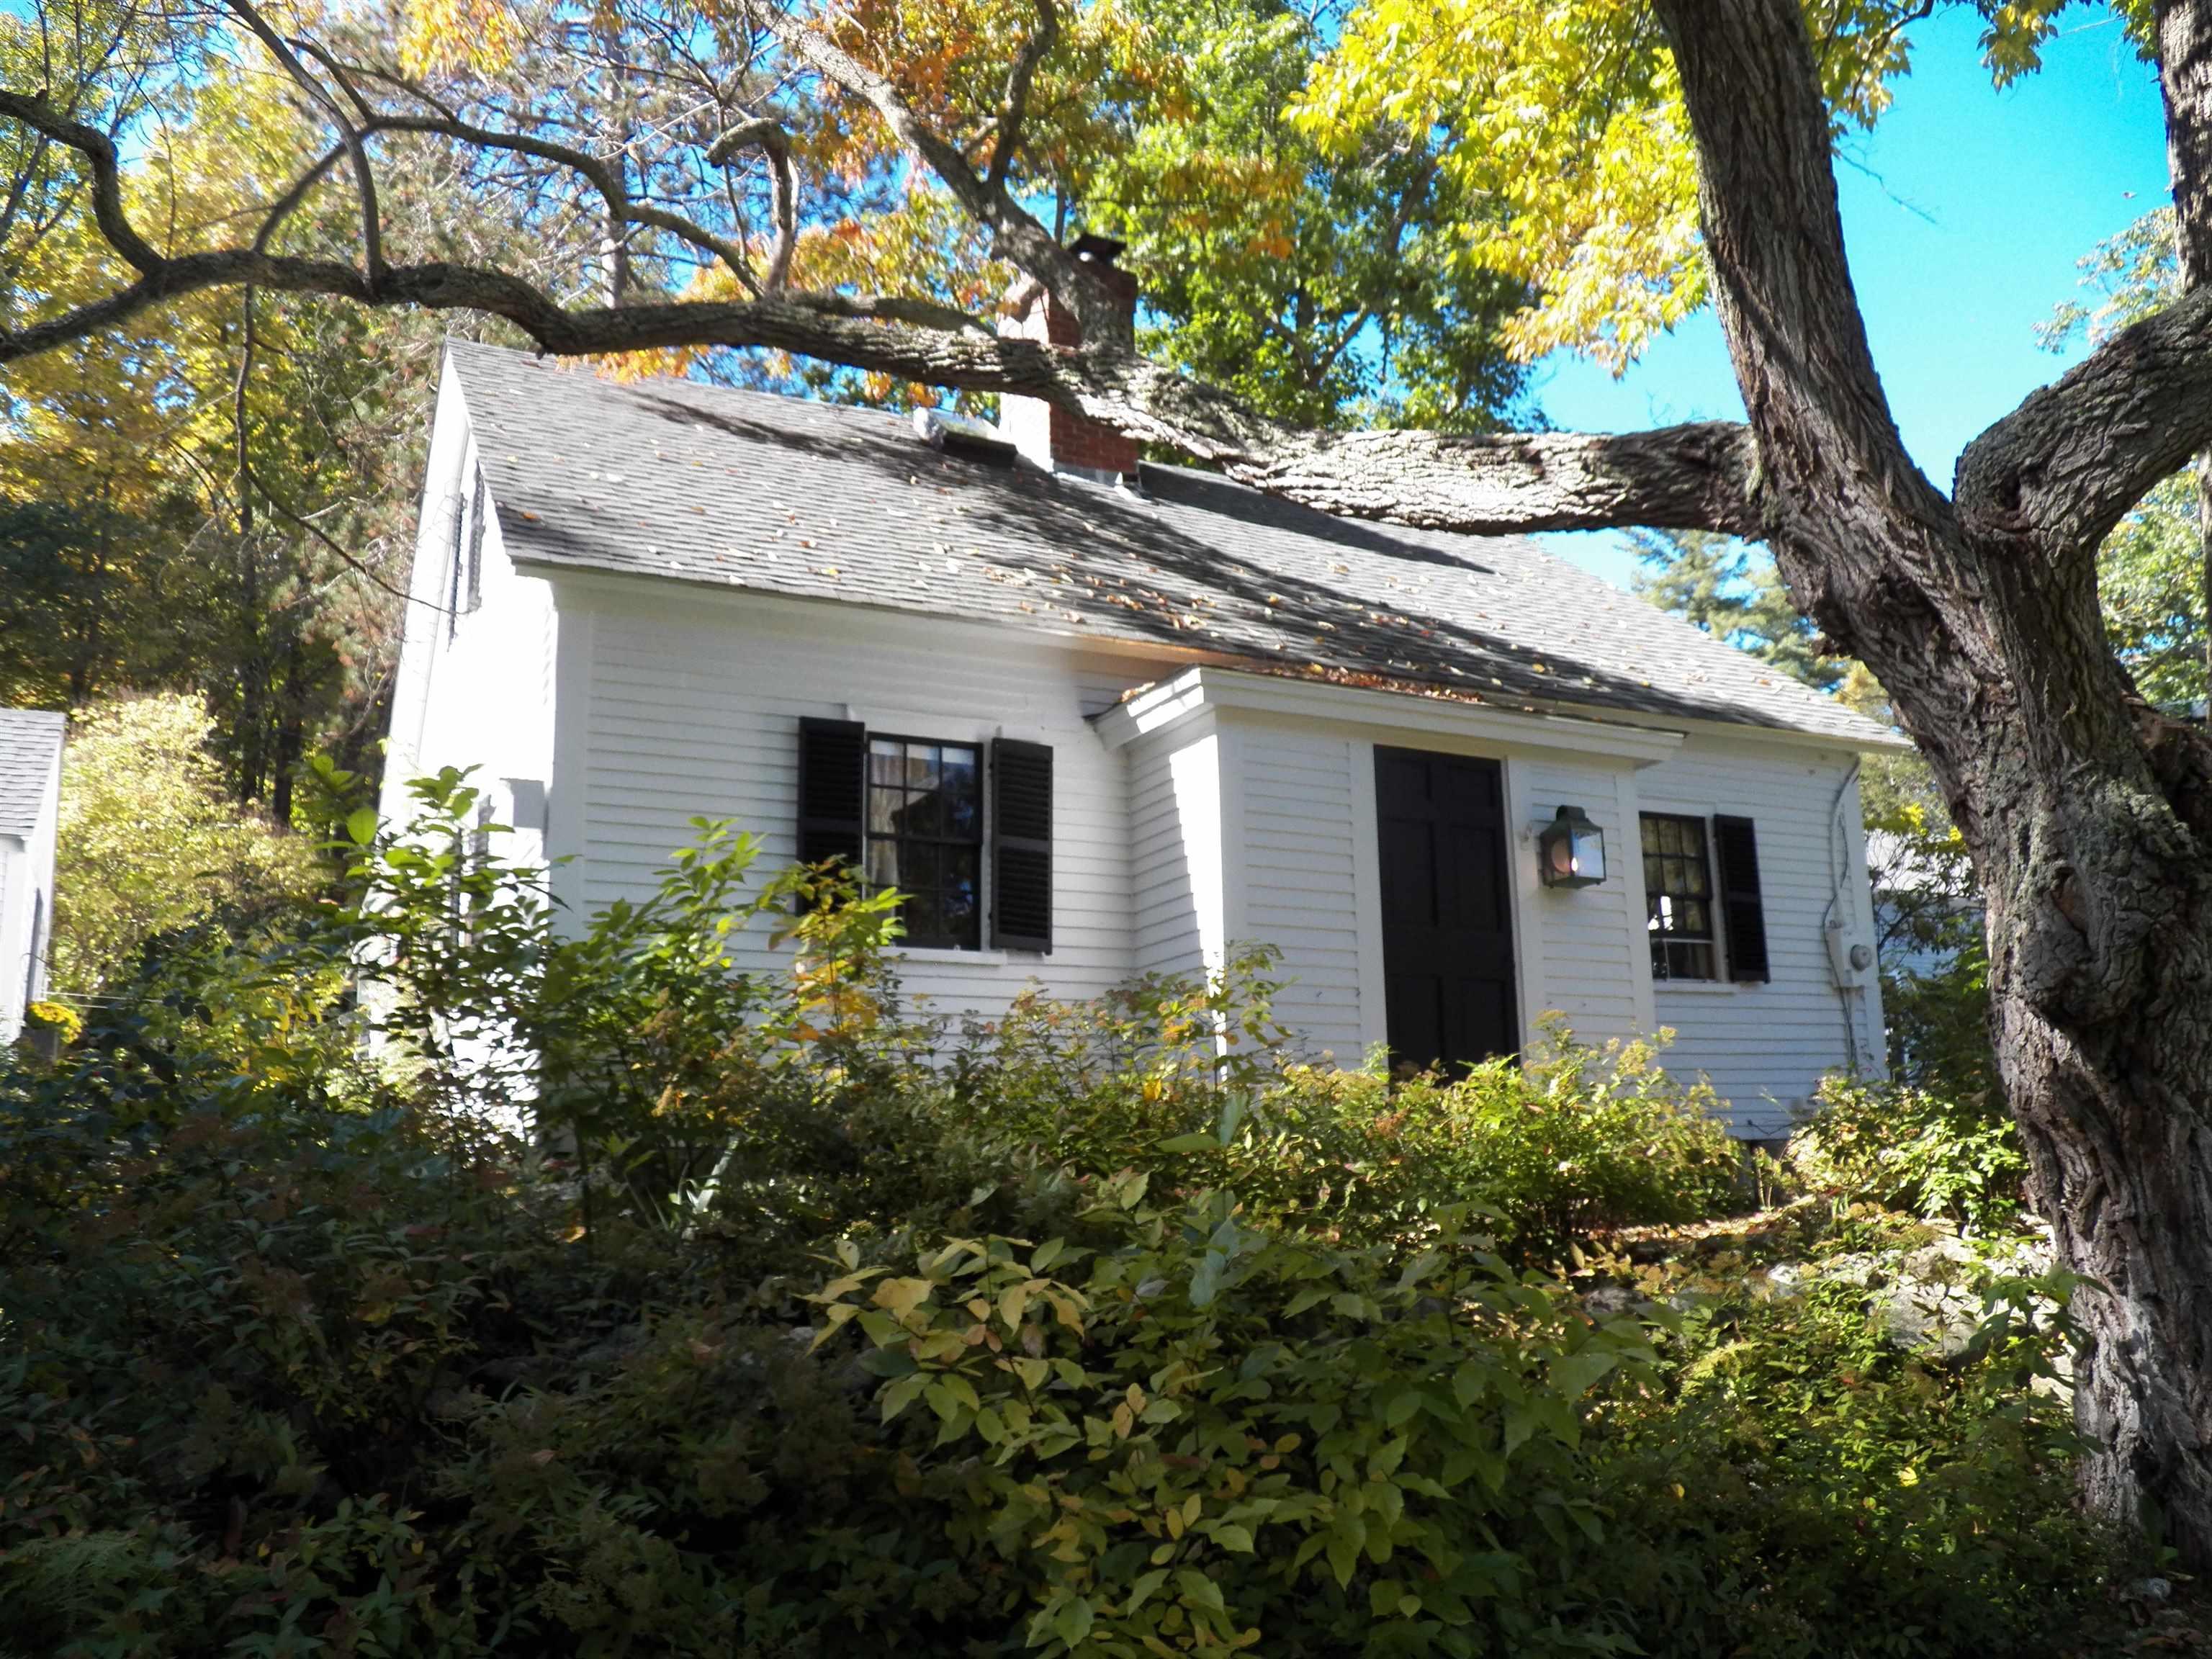 84 Temple Road, Wilton, NH 03086